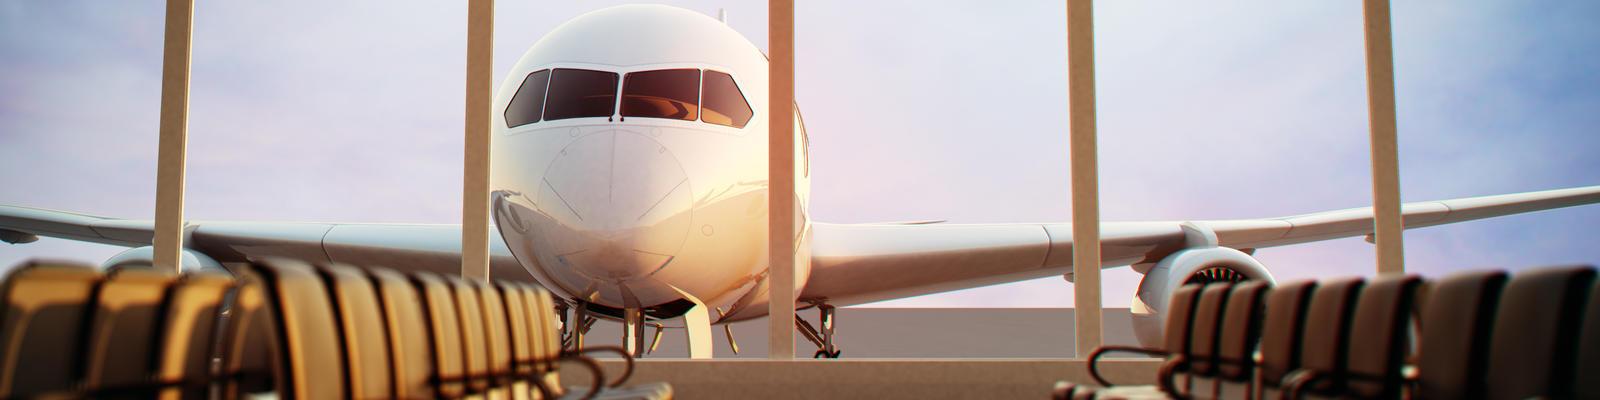 Airline terminal (Photo: Dabarti CGI/Shutterstock.com)